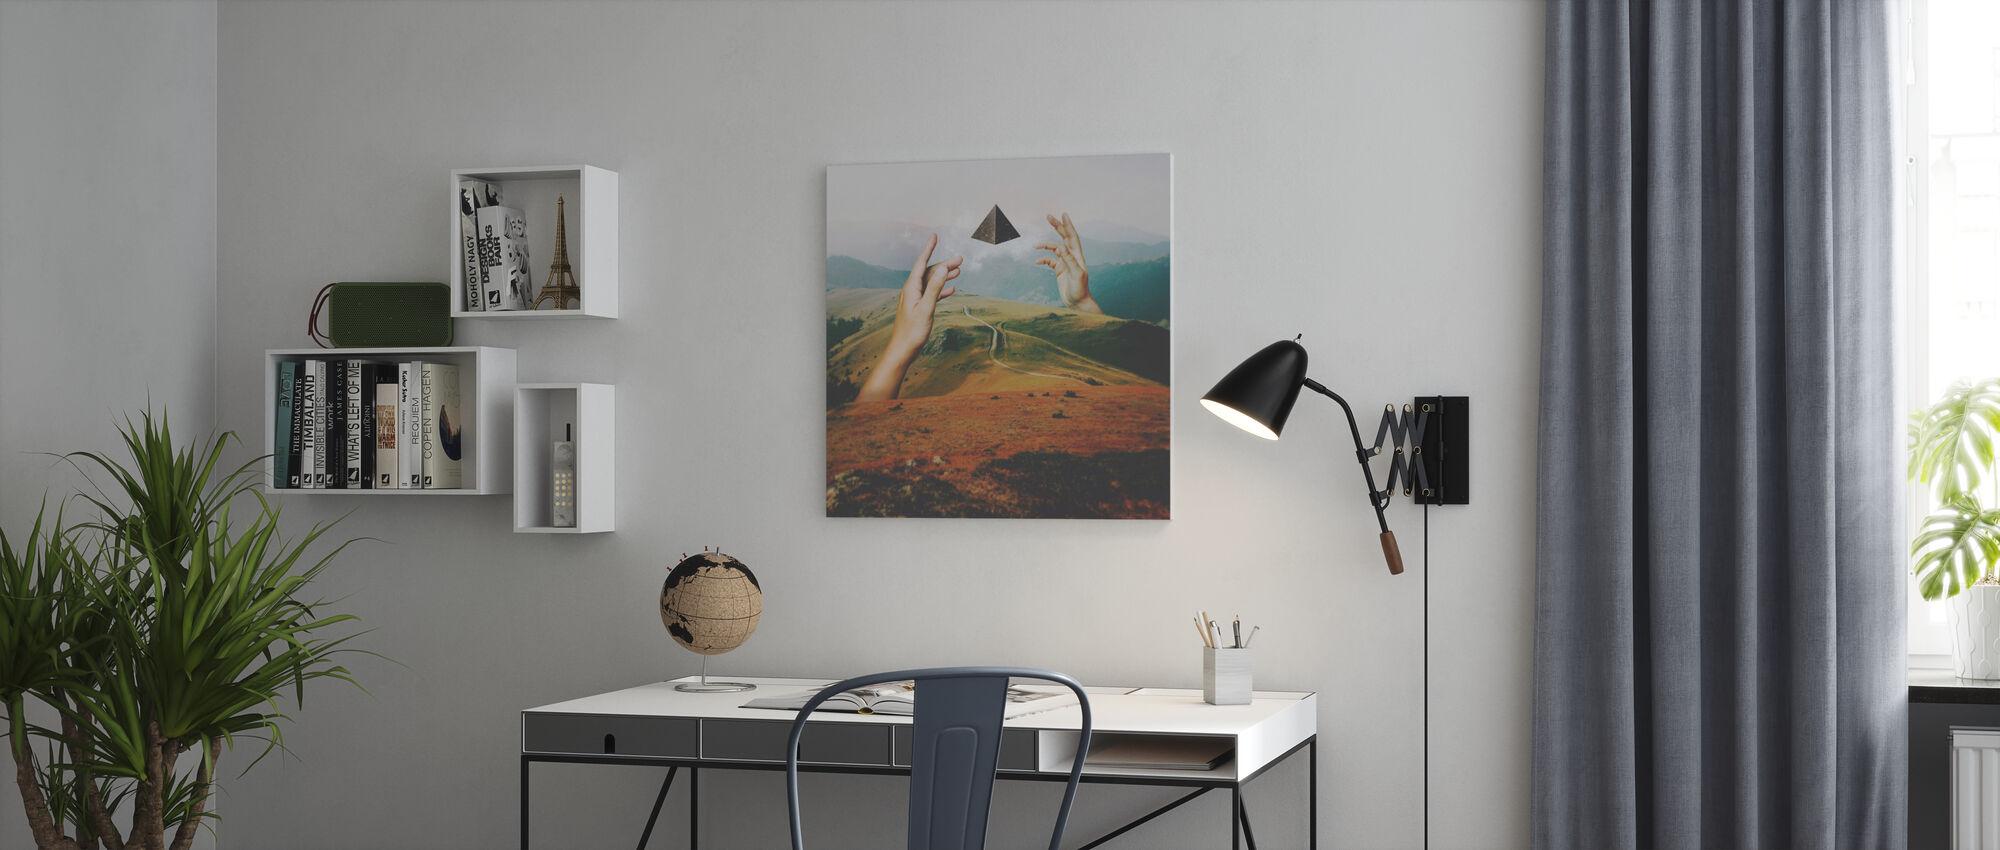 Portalen - Canvastavla - Kontor